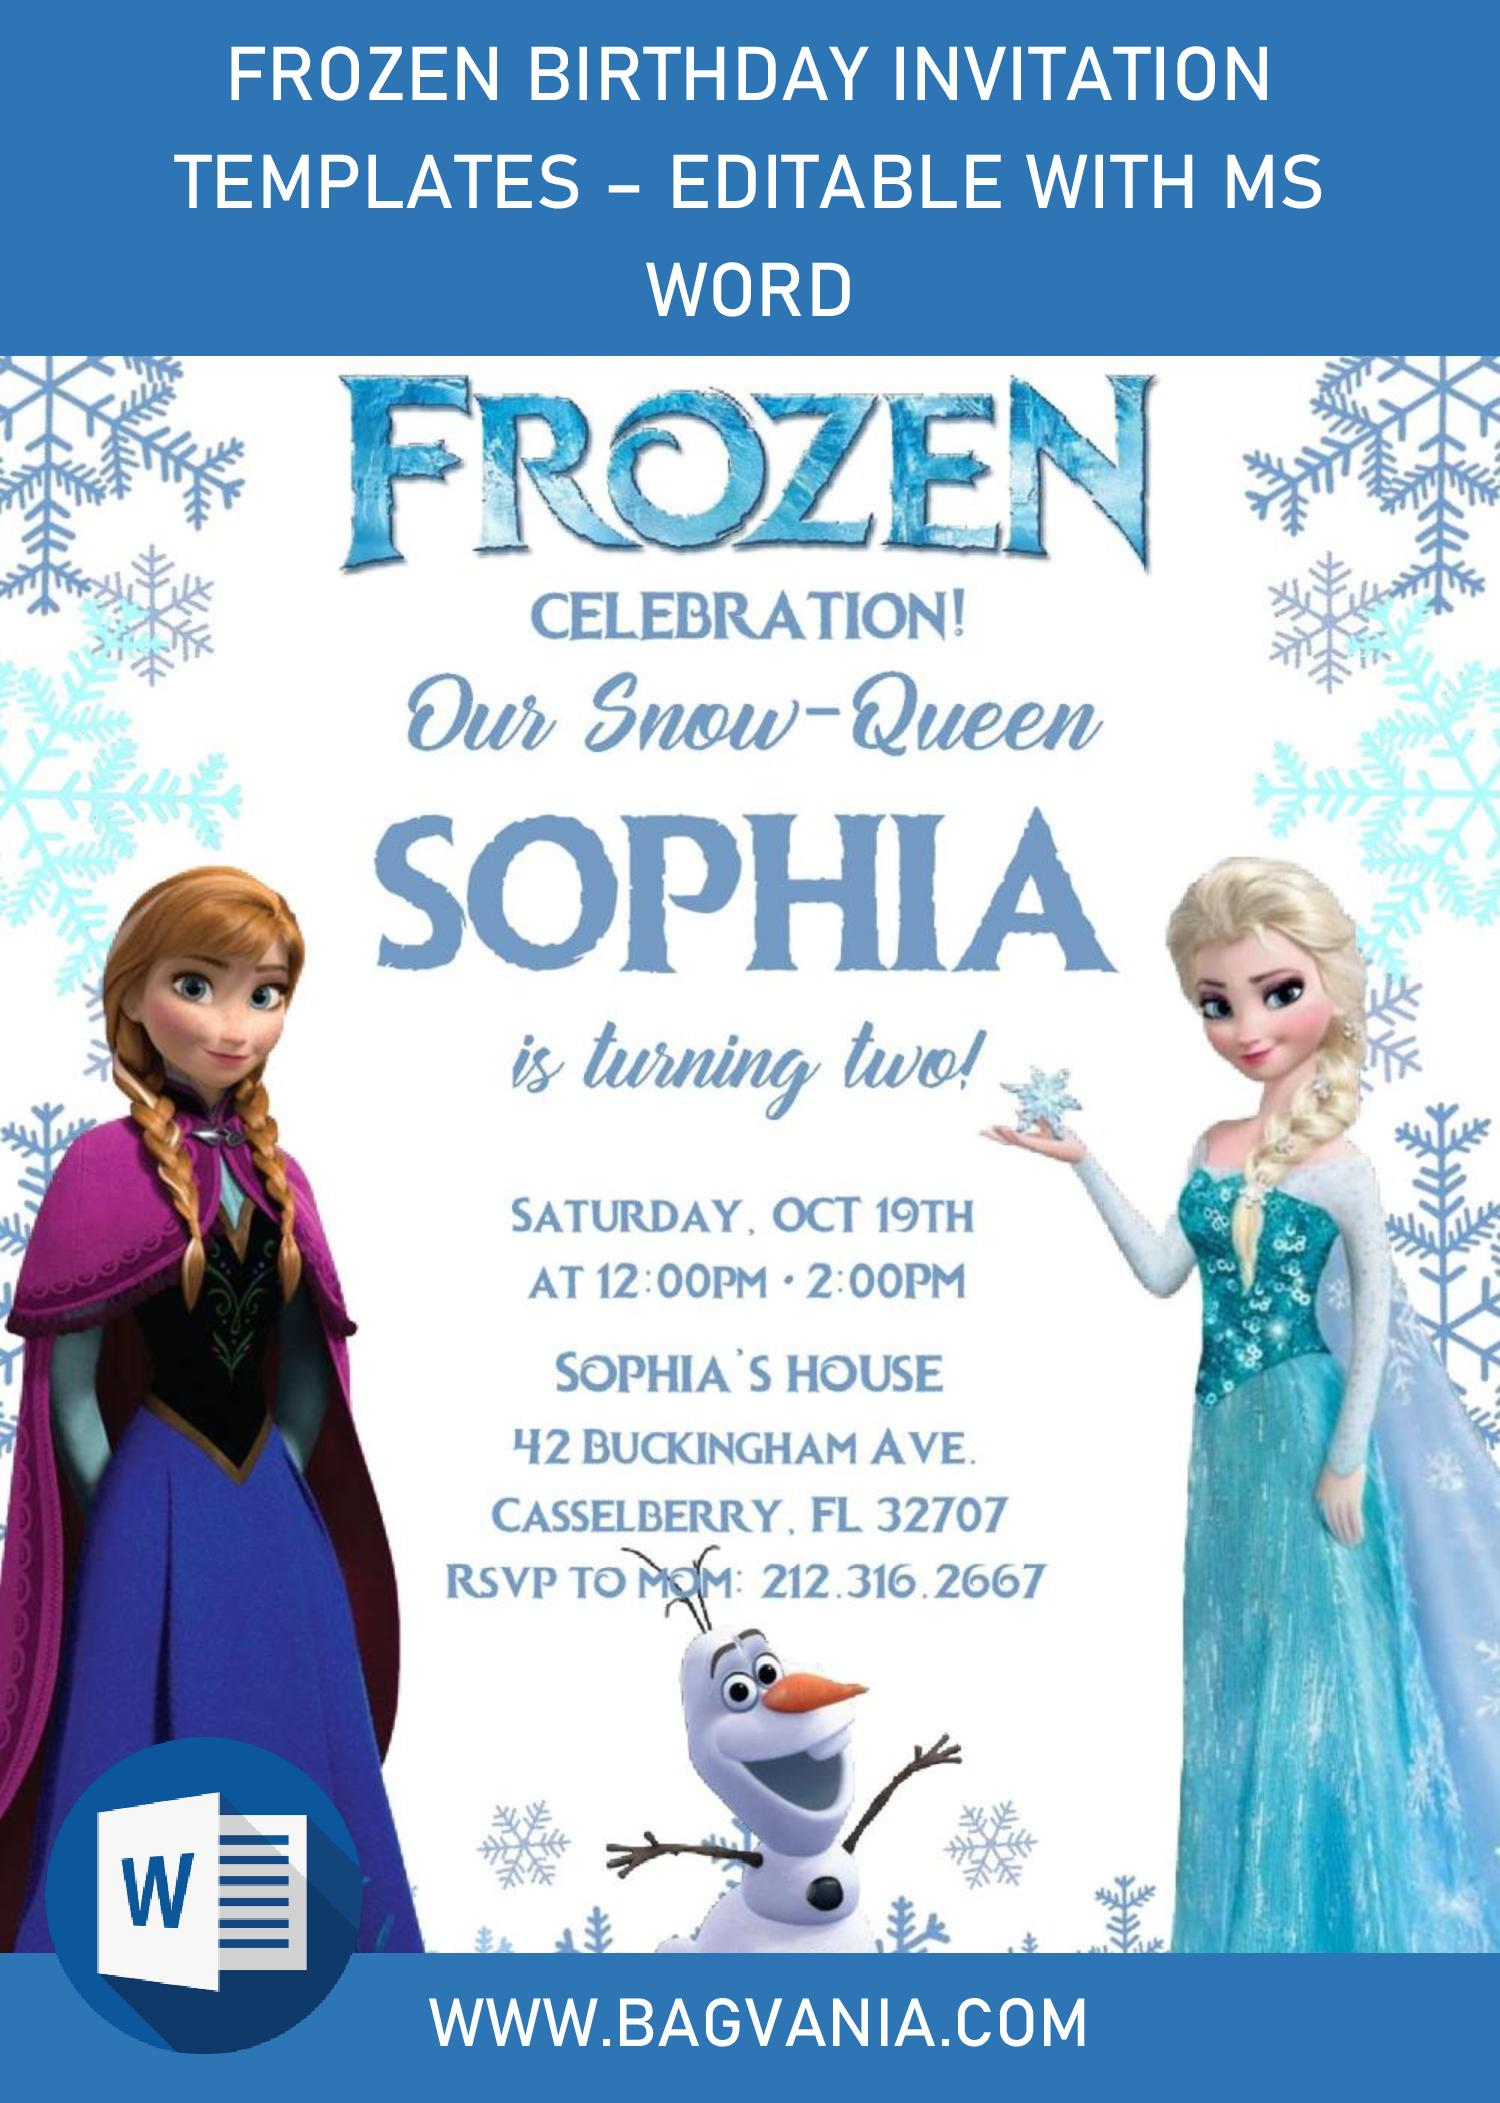 frozen invitation templates editable